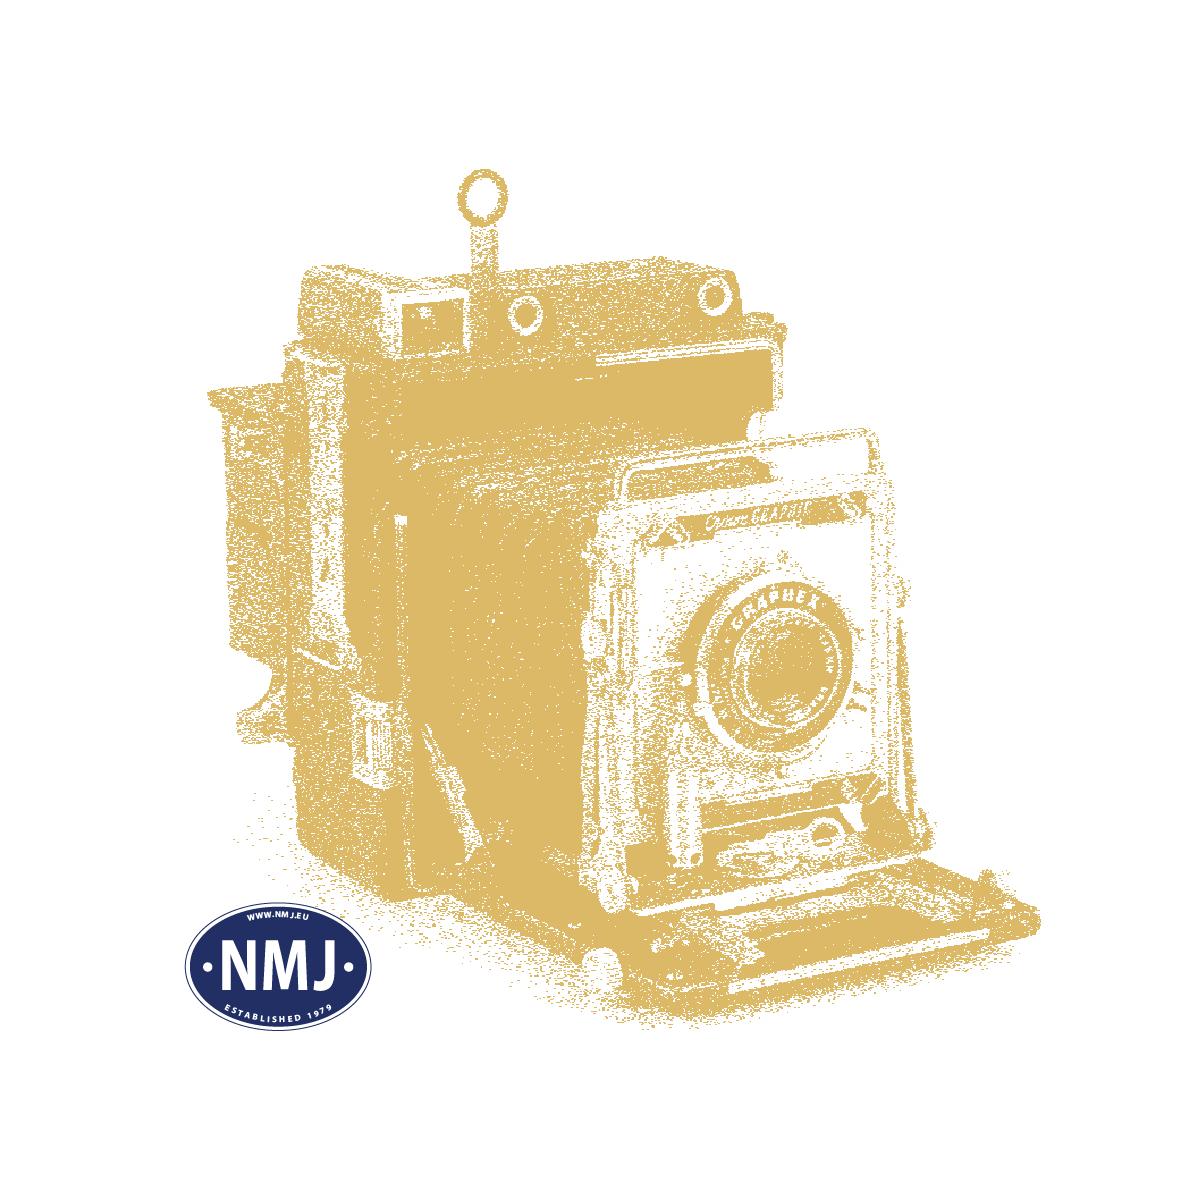 NMJT80.201AC - NMJ Topline NSB EL17.2228, AC, rot/schwarz